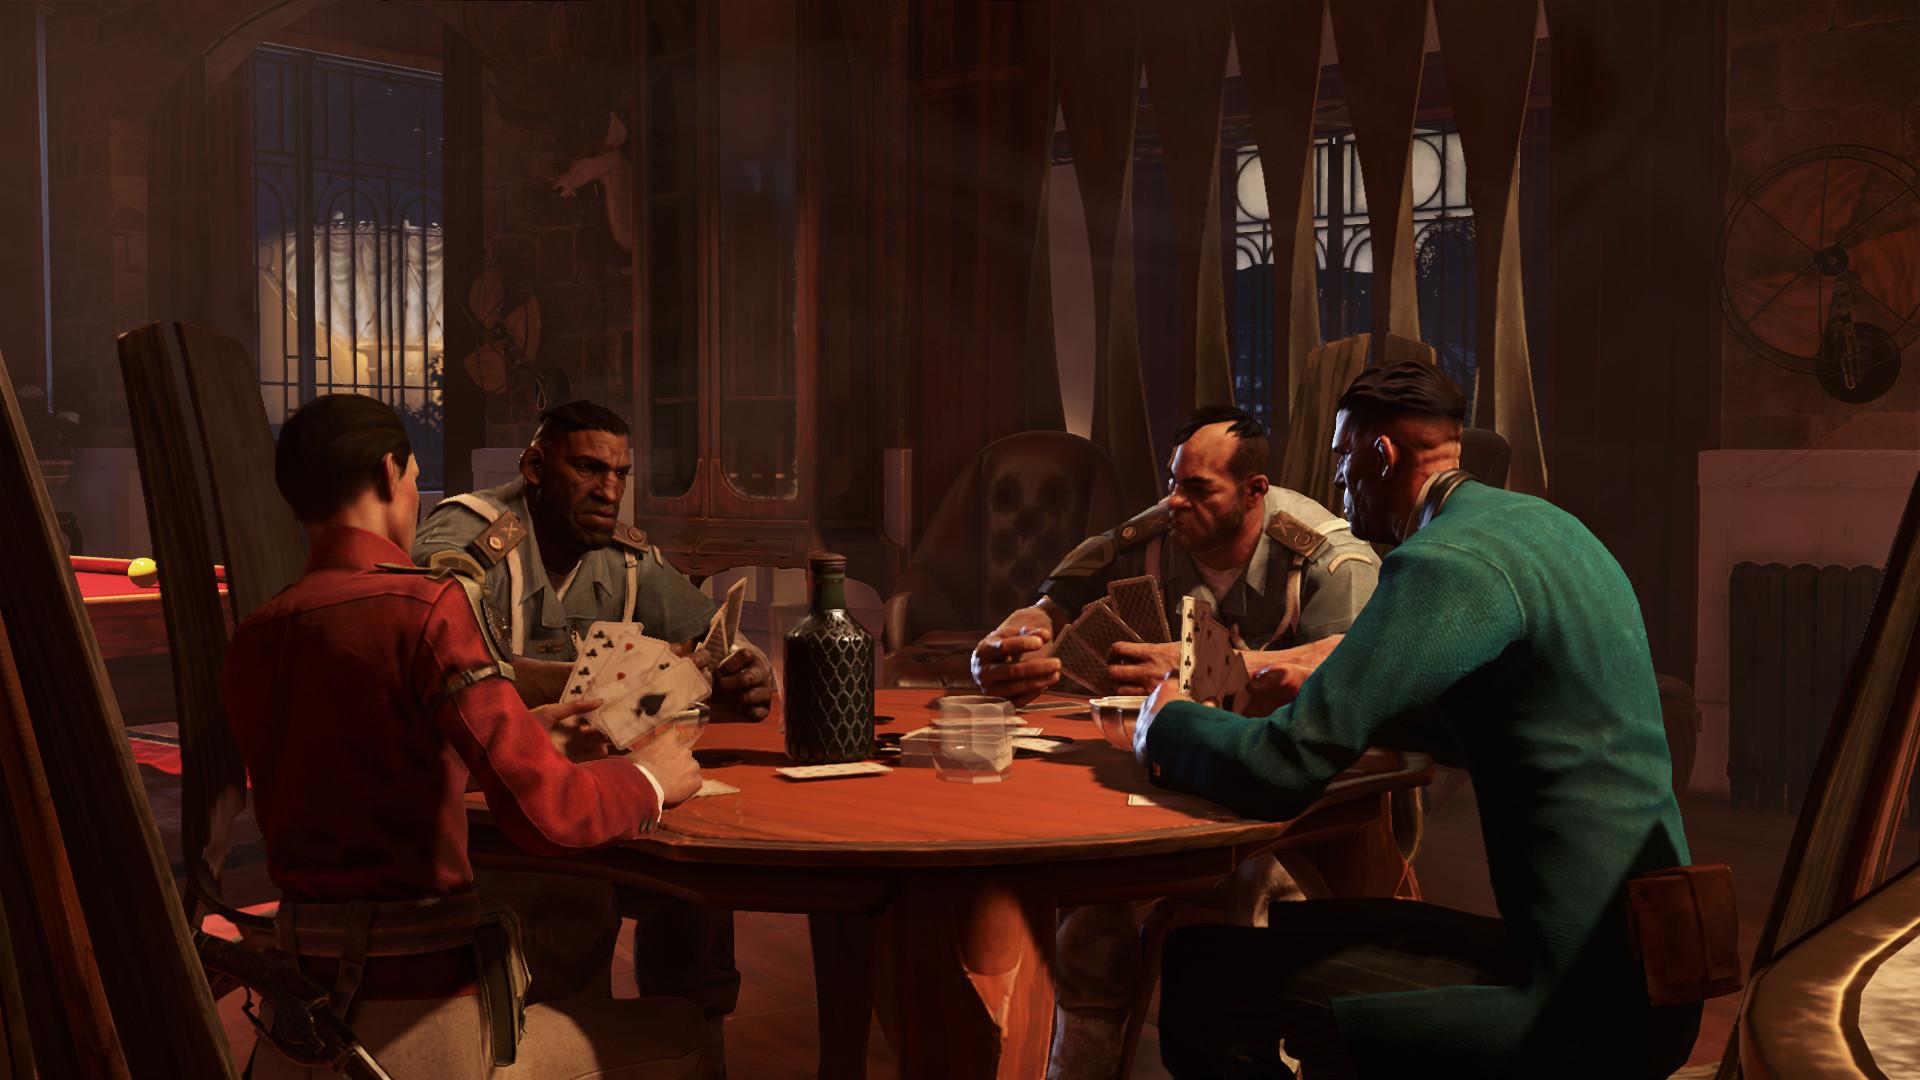 Опубликован релизный трейлер Dishonored: Death of the Outsider